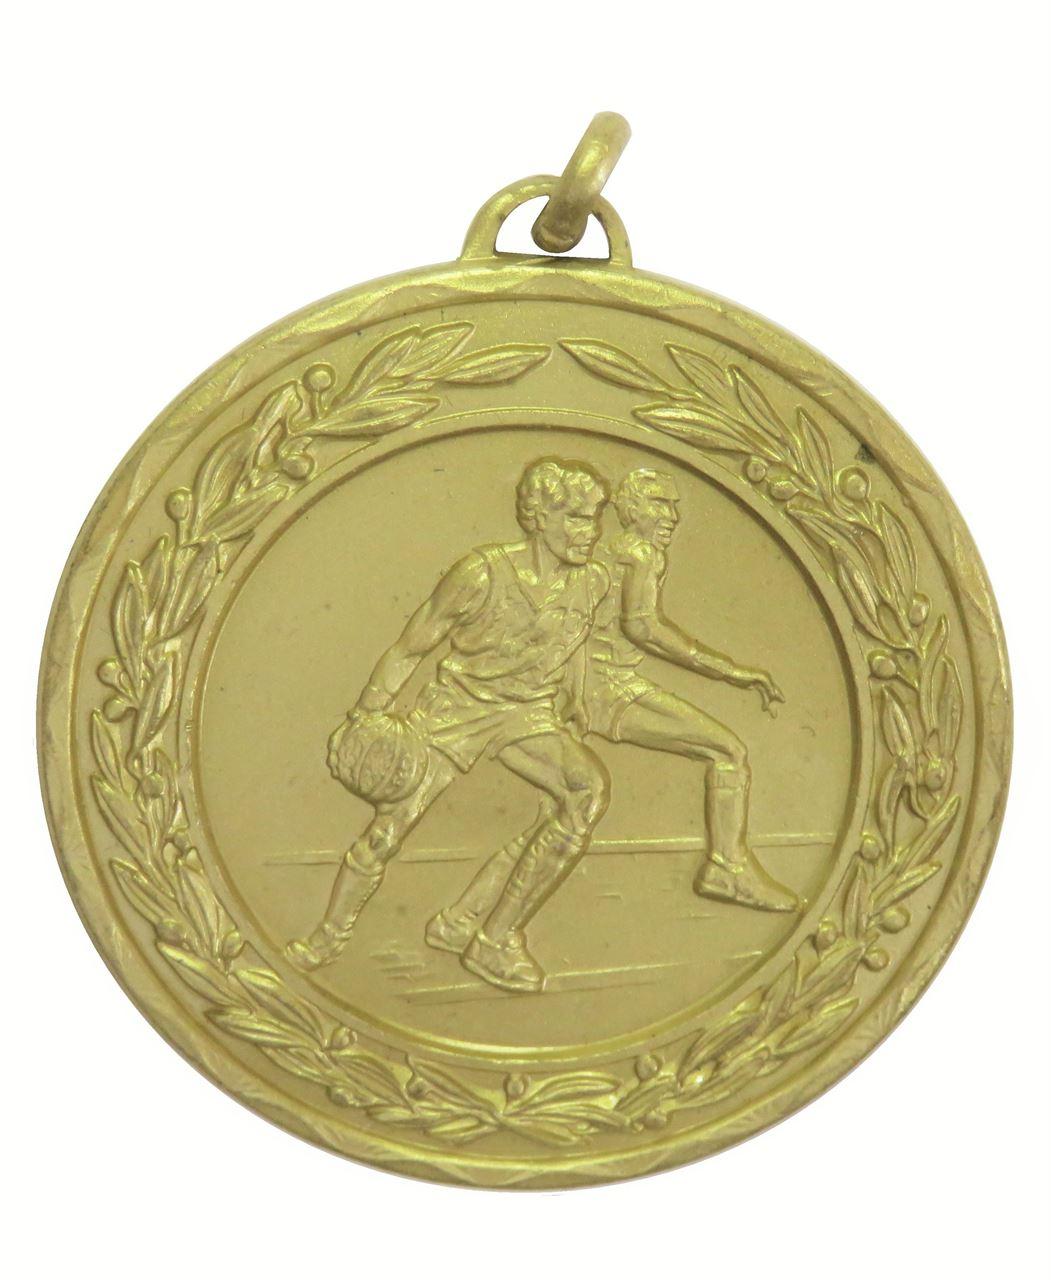 Gold Laurel Economy Basketball Medal (size: 50mm) - 4075E